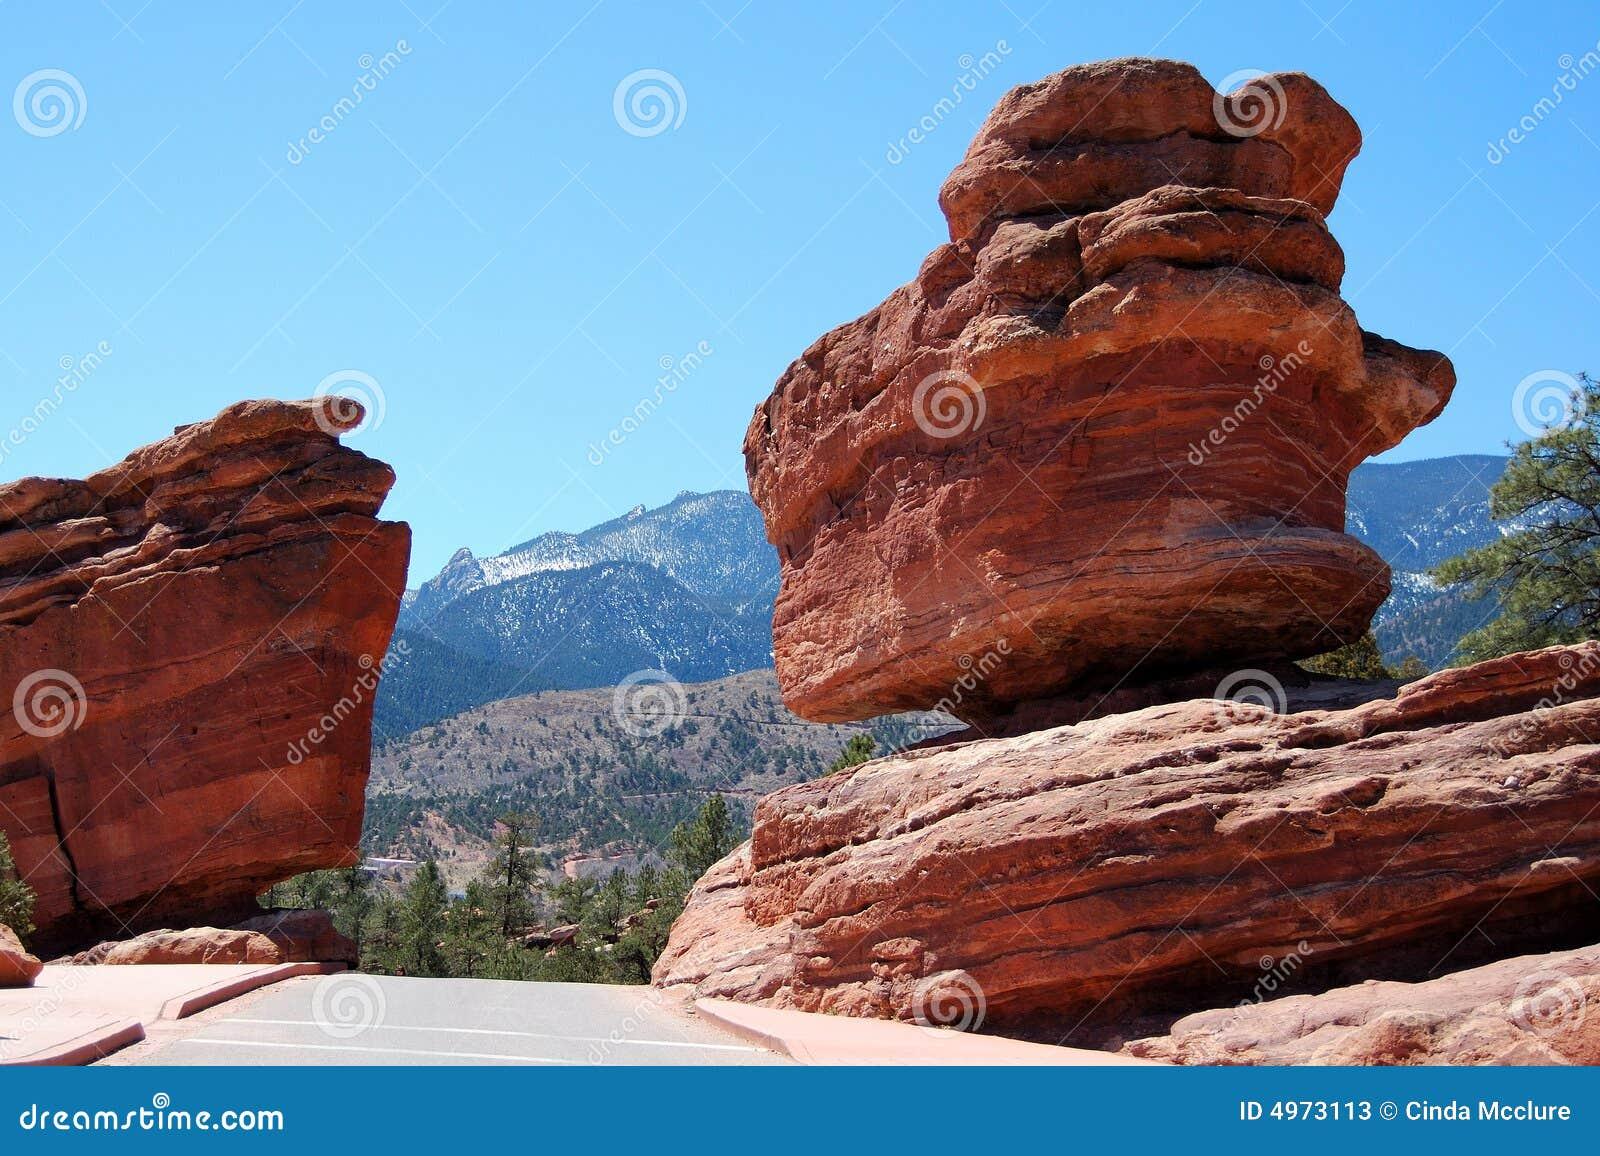 Balanced Rock Garden Of Gods Stock Photos Image 4973113